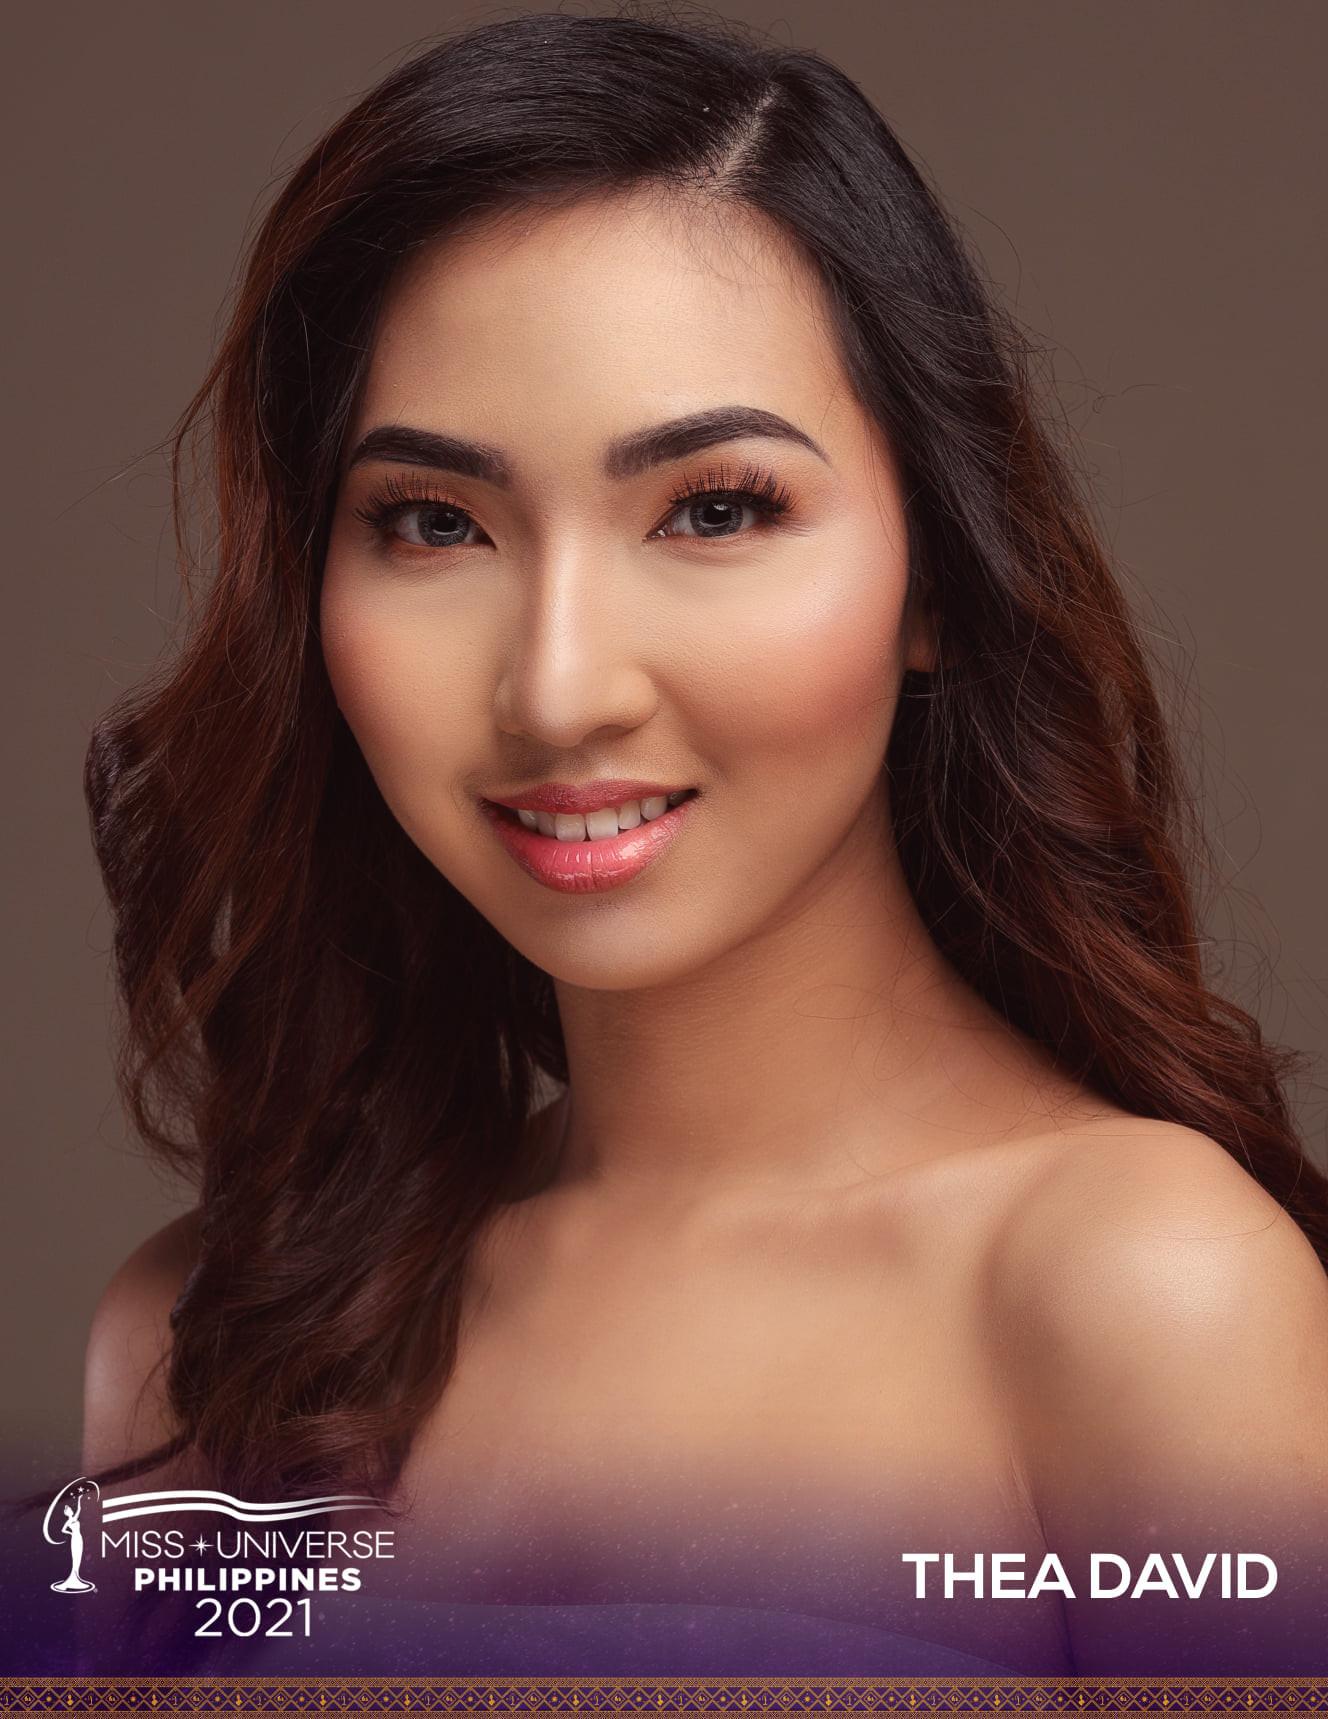 pre-candidatas a miss universe philippines 2021. - Página 4 AlRbM7